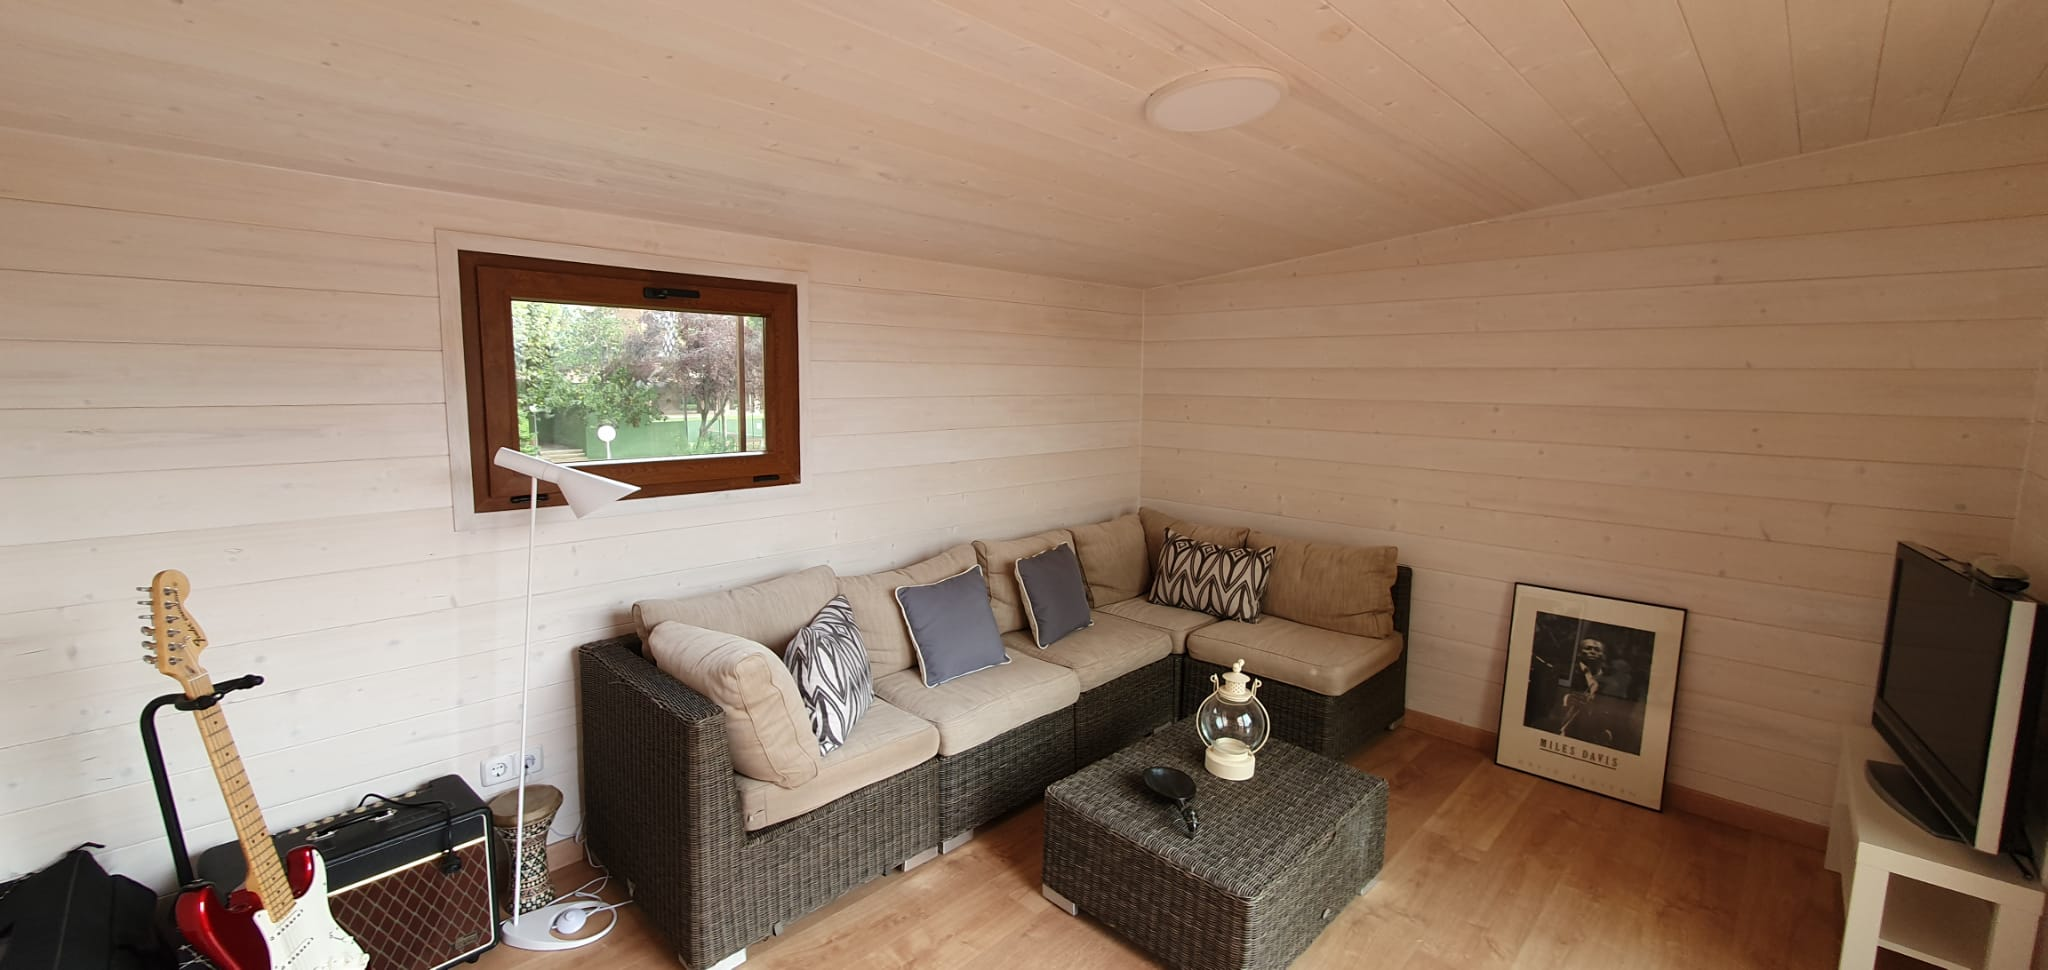 Interior caseta madera habitable 14m2 Caseta Living